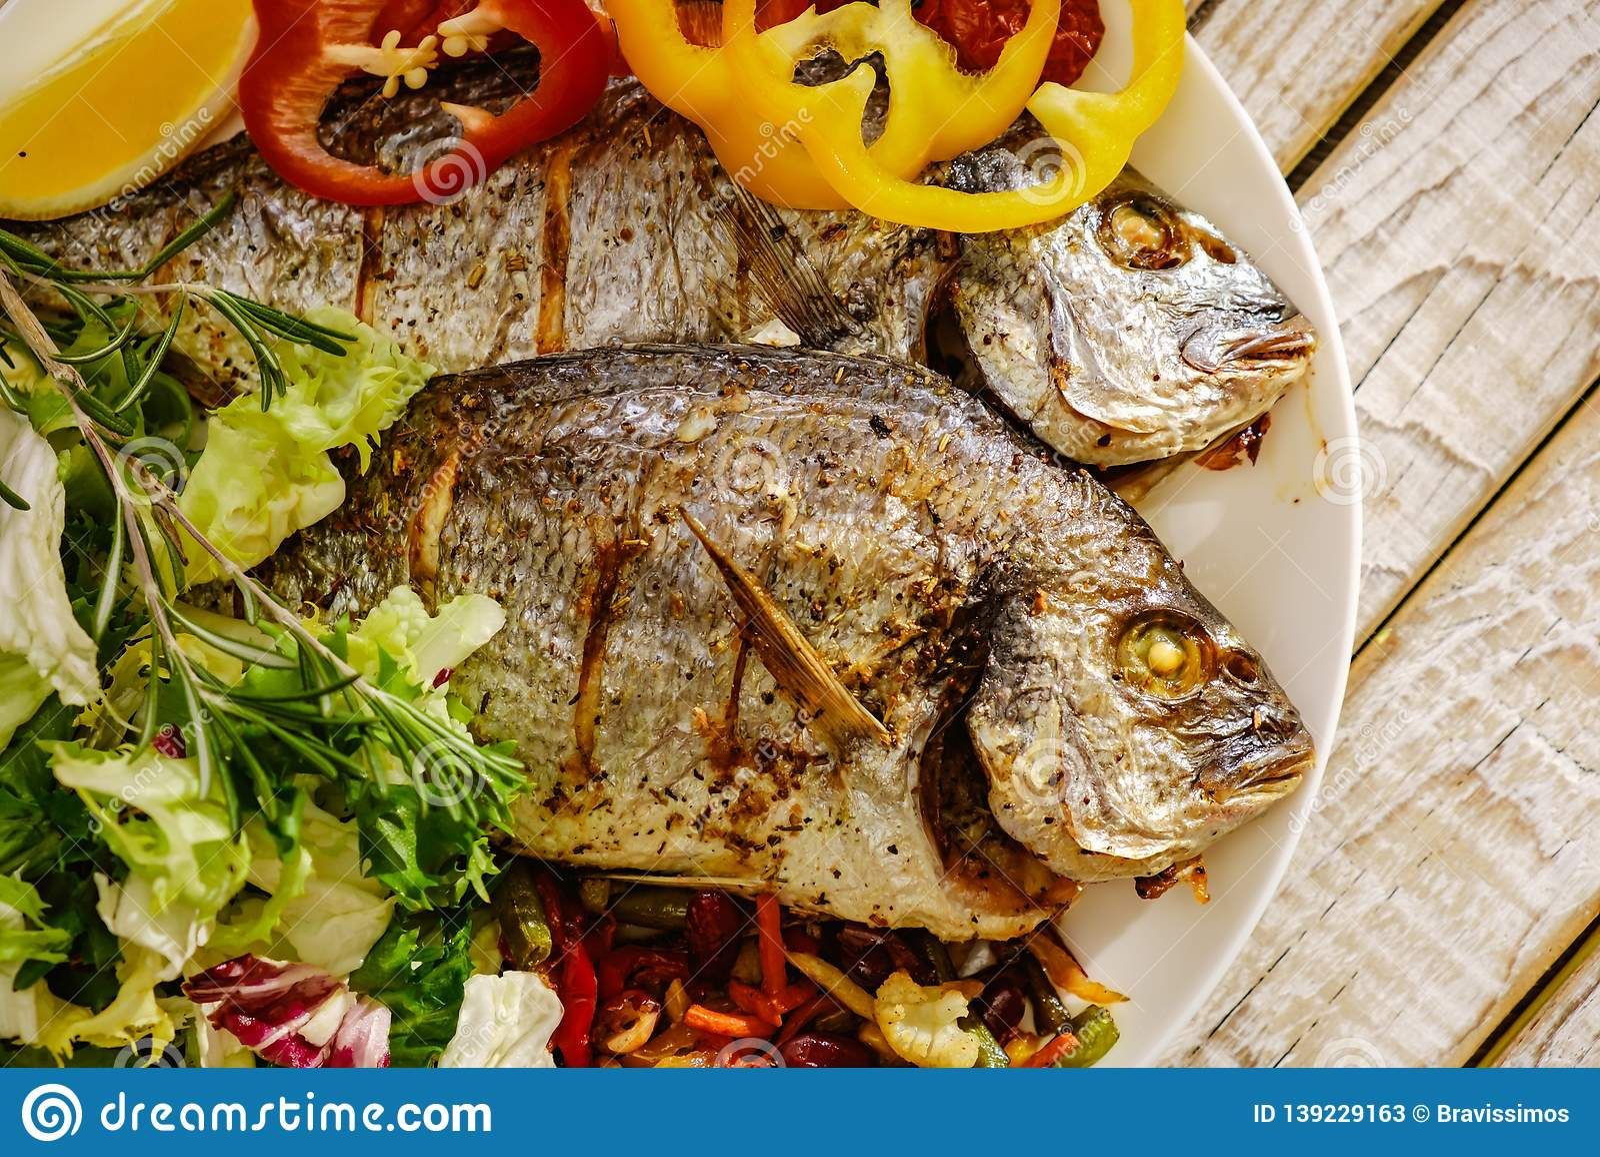 Food Fish Fresh Dorado, Meal Seafood Dinner, Raw Delicious ...